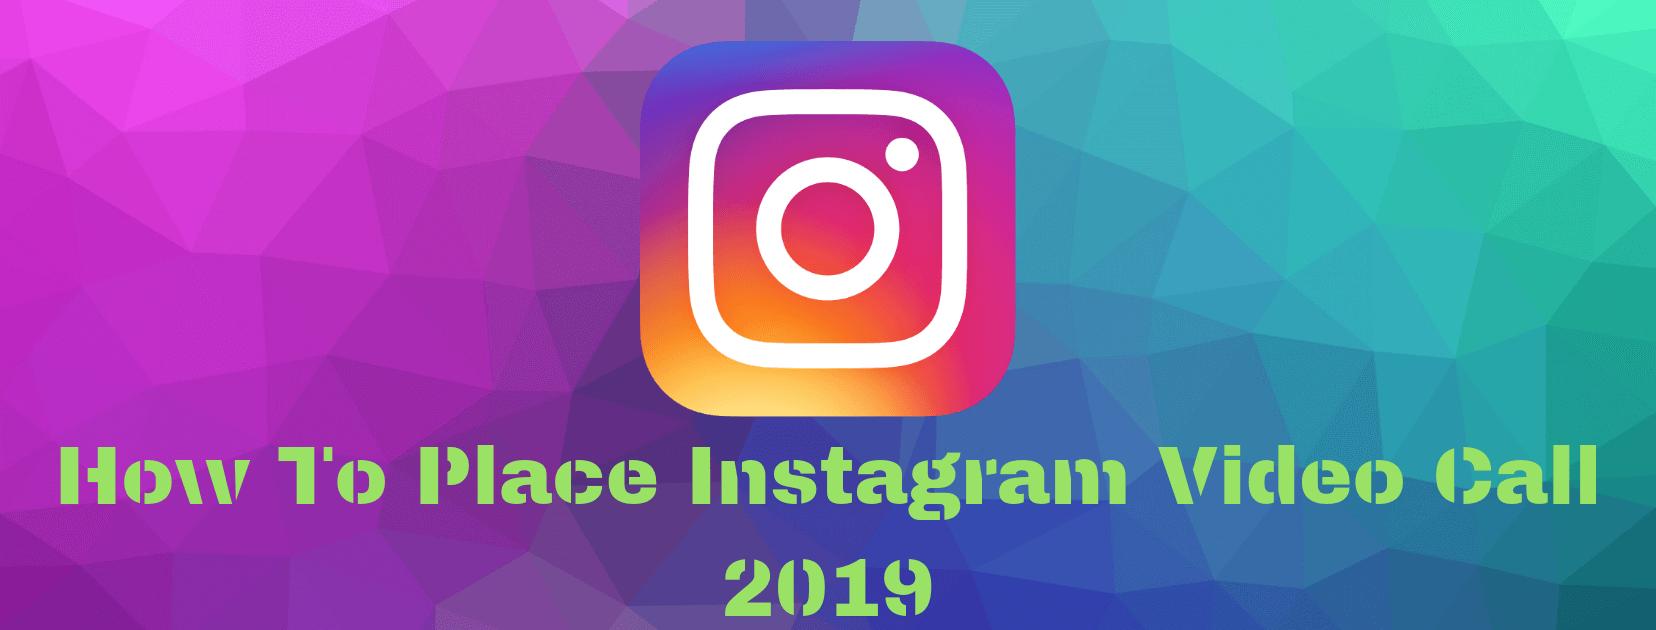 Video Call Instagram 2019